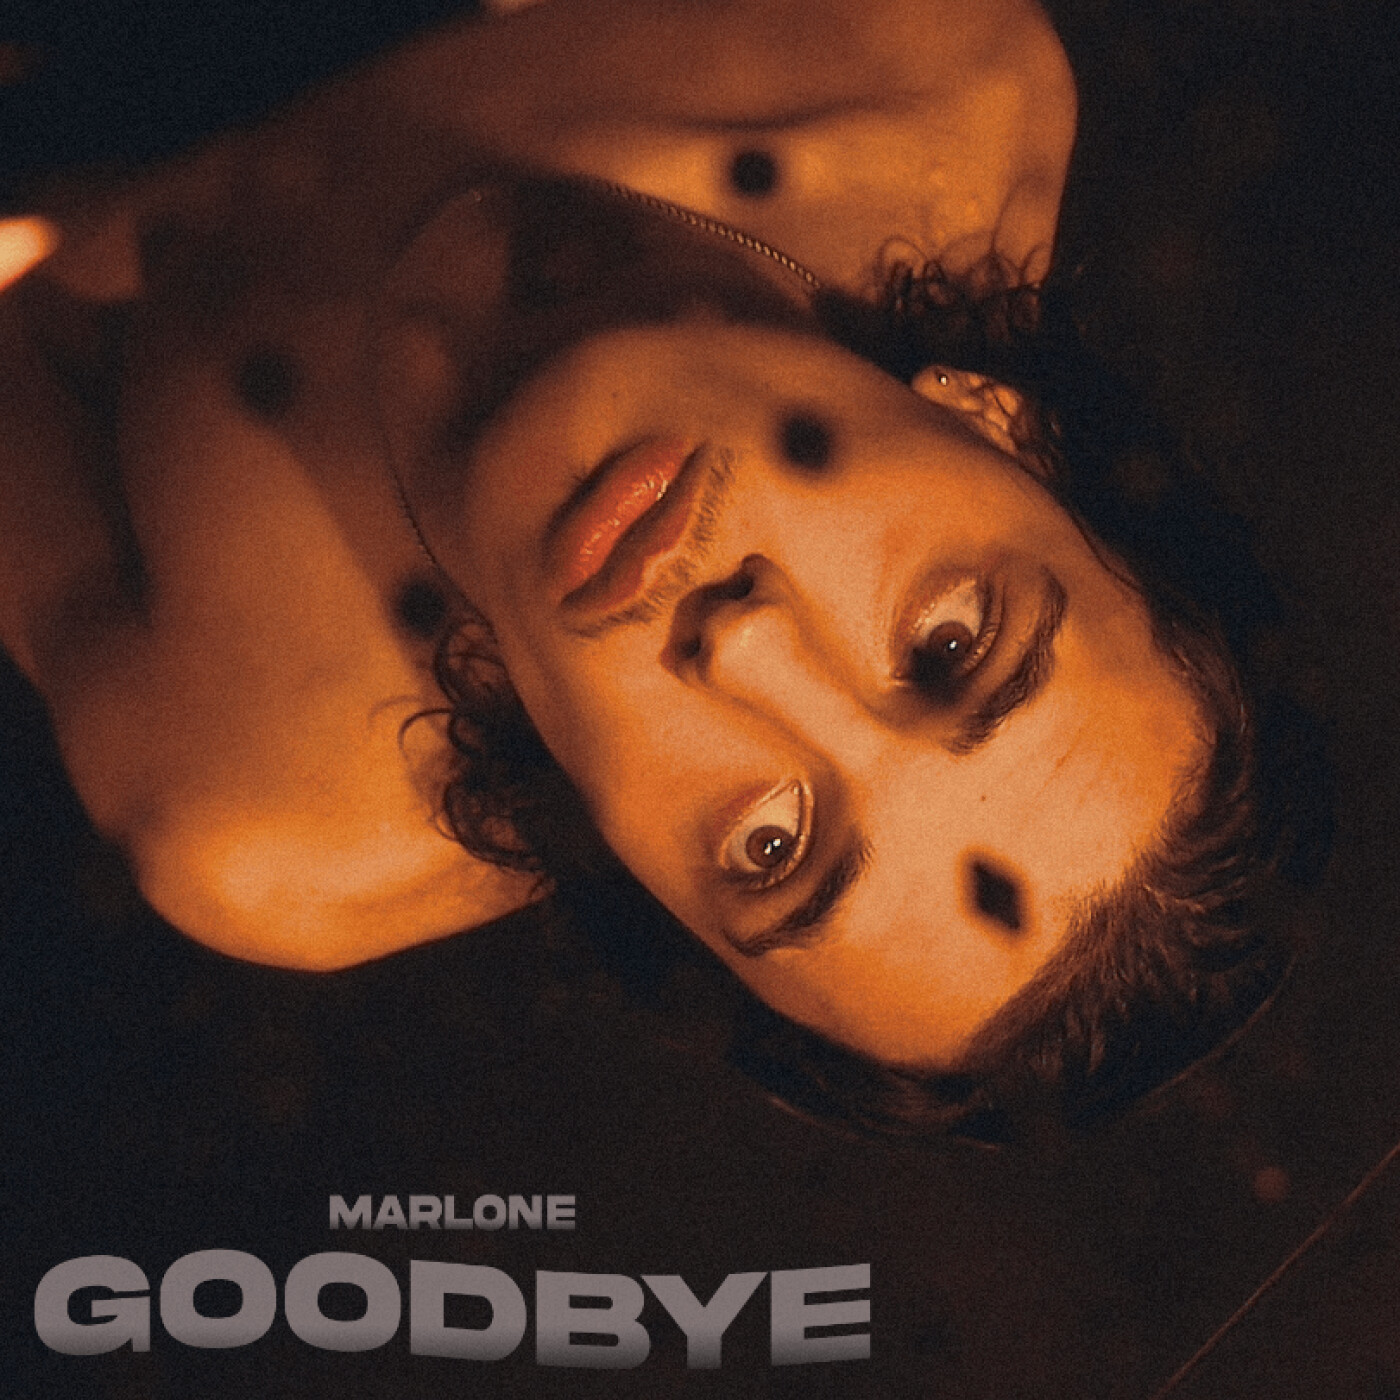 Artiste du jour, Marlone présente son deuxieme single Goodbye - 21 05 21 - StereoChic Radio